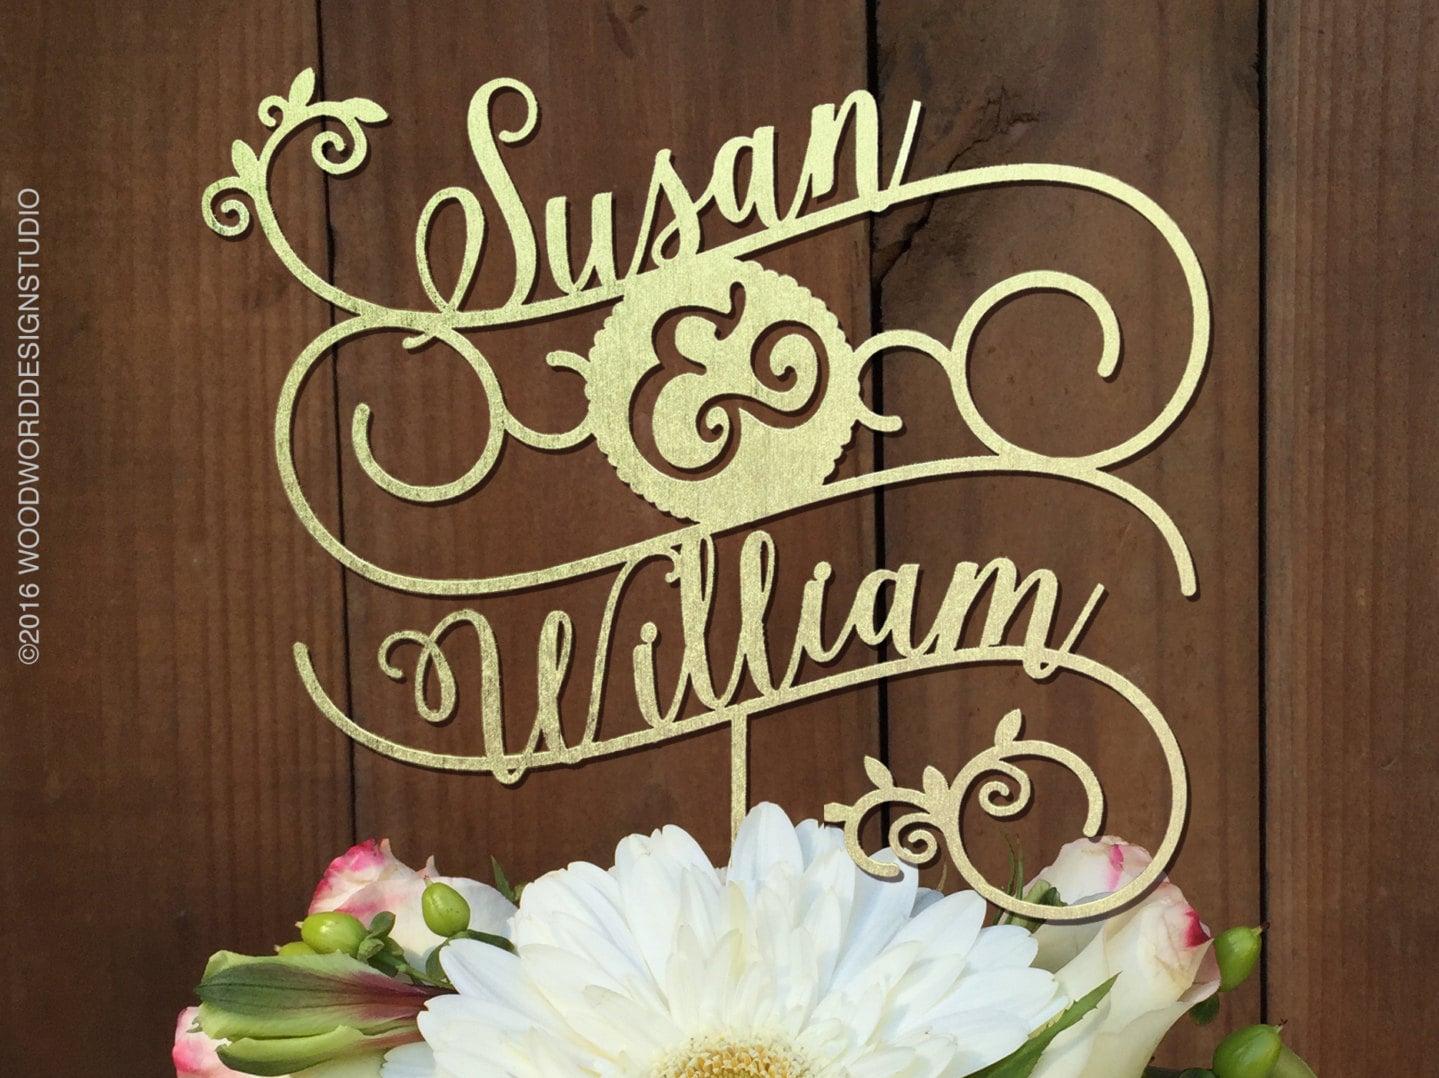 Custom Cake Topper for Wedding Cake Names in a decorative